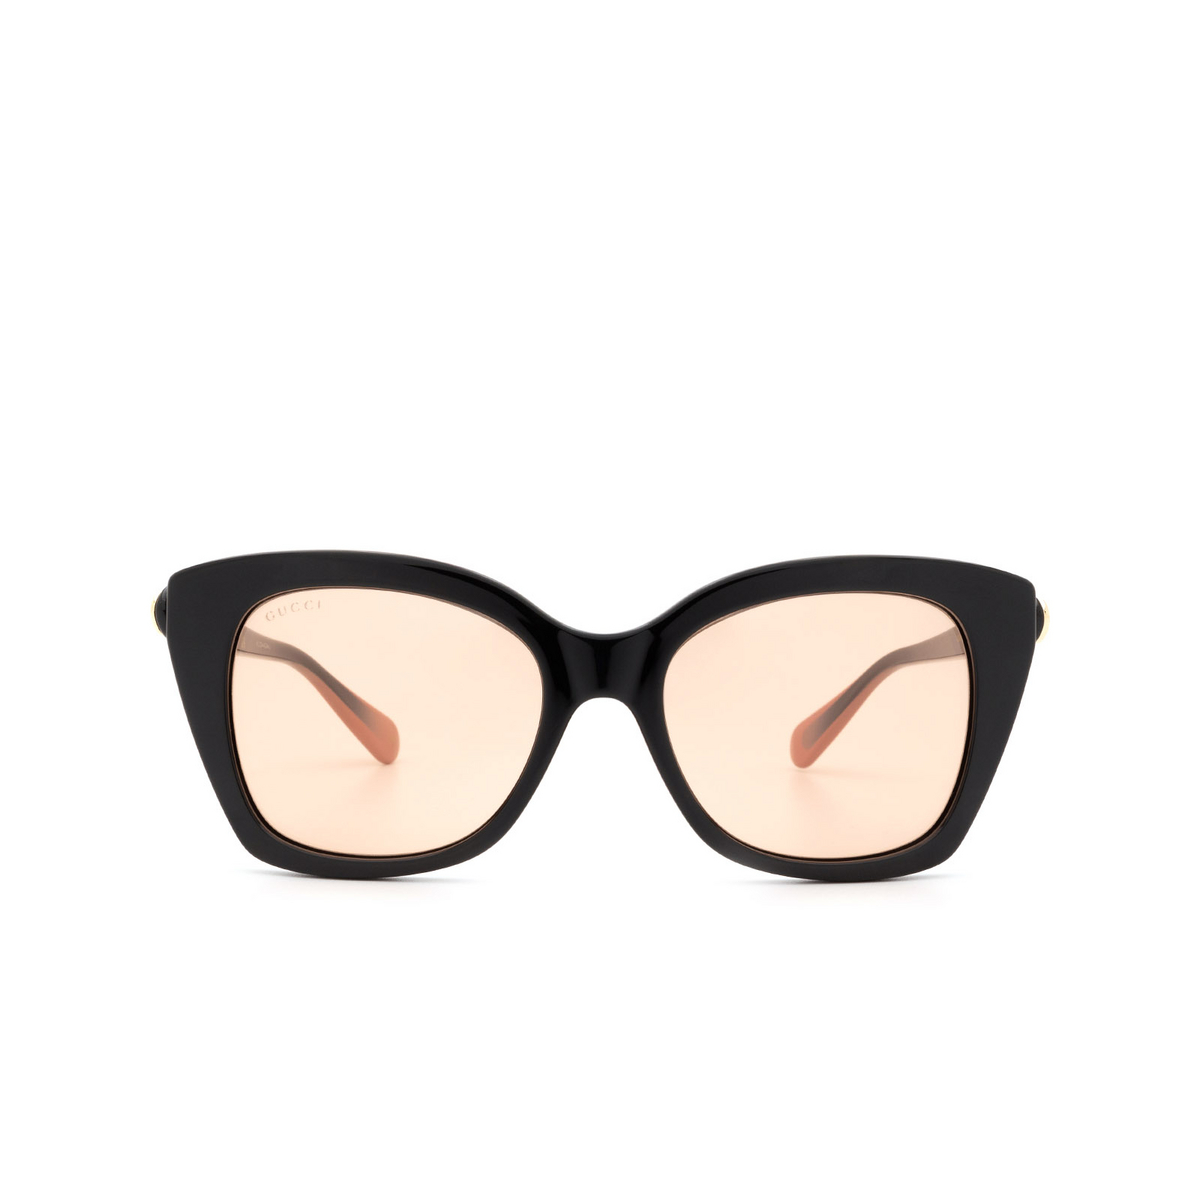 Gucci® Butterfly Sunglasses: GG0921S color Black 003.